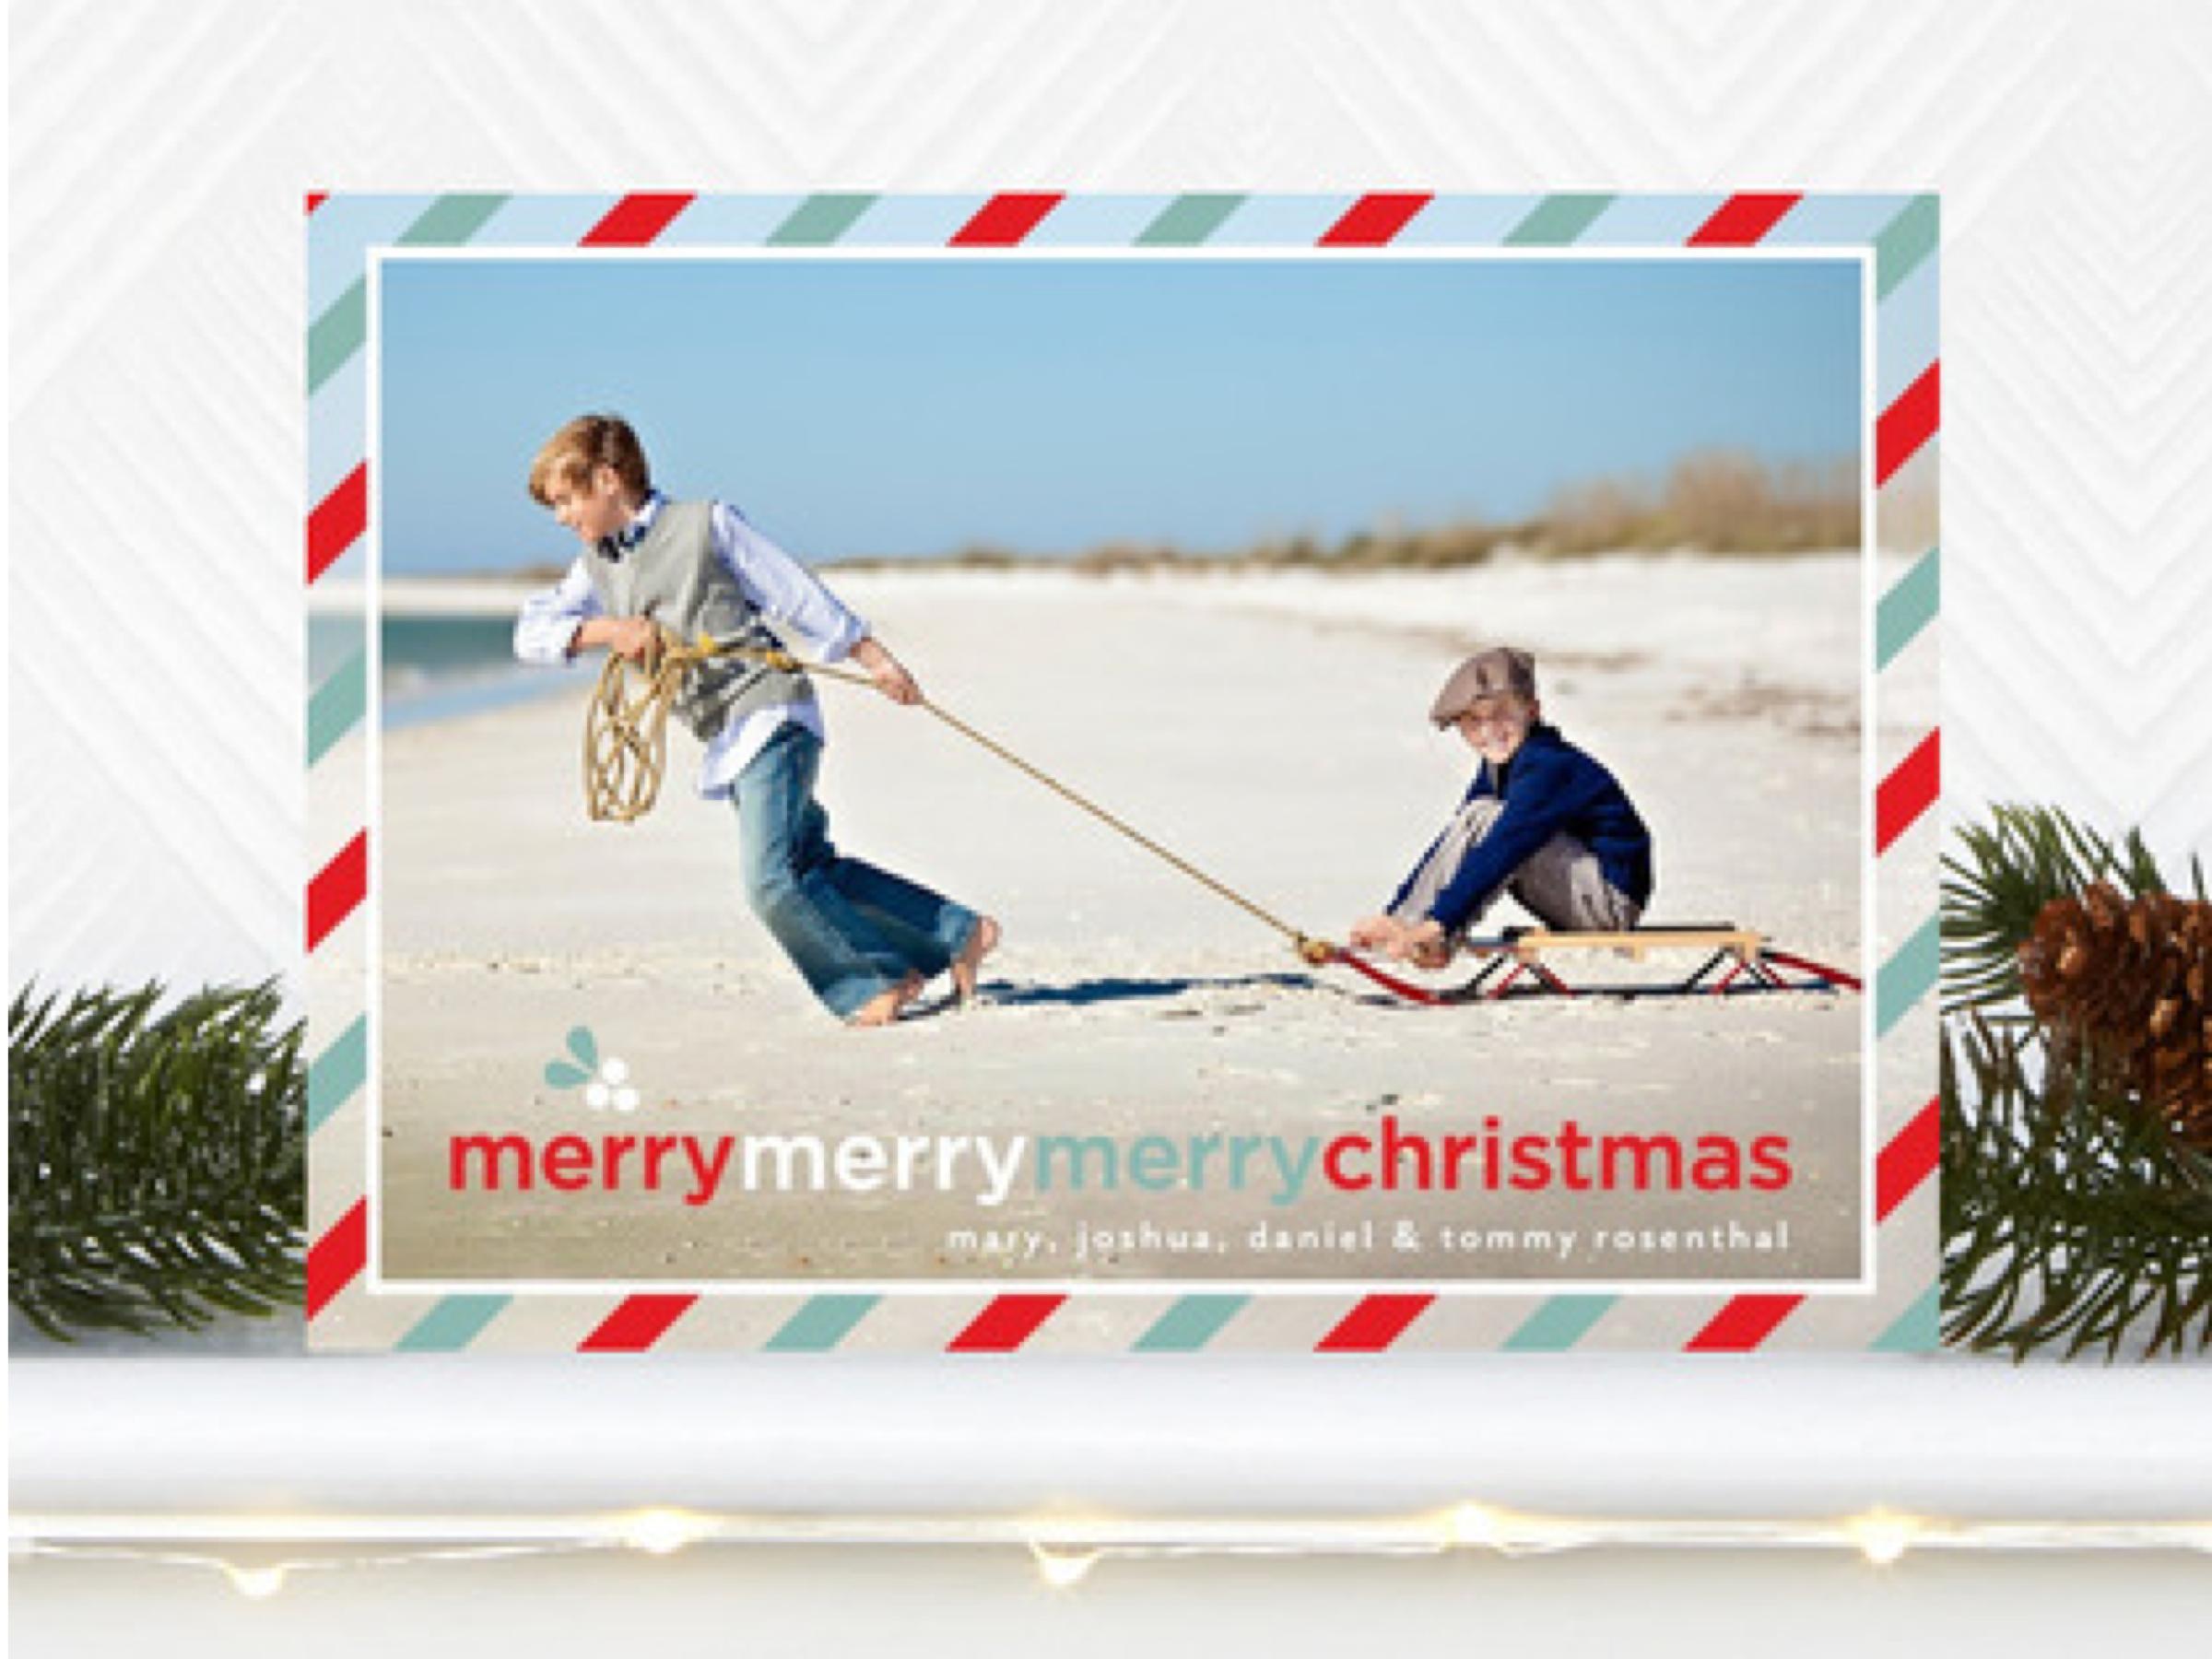 Wishing You a Merry Merry Merry Christmas